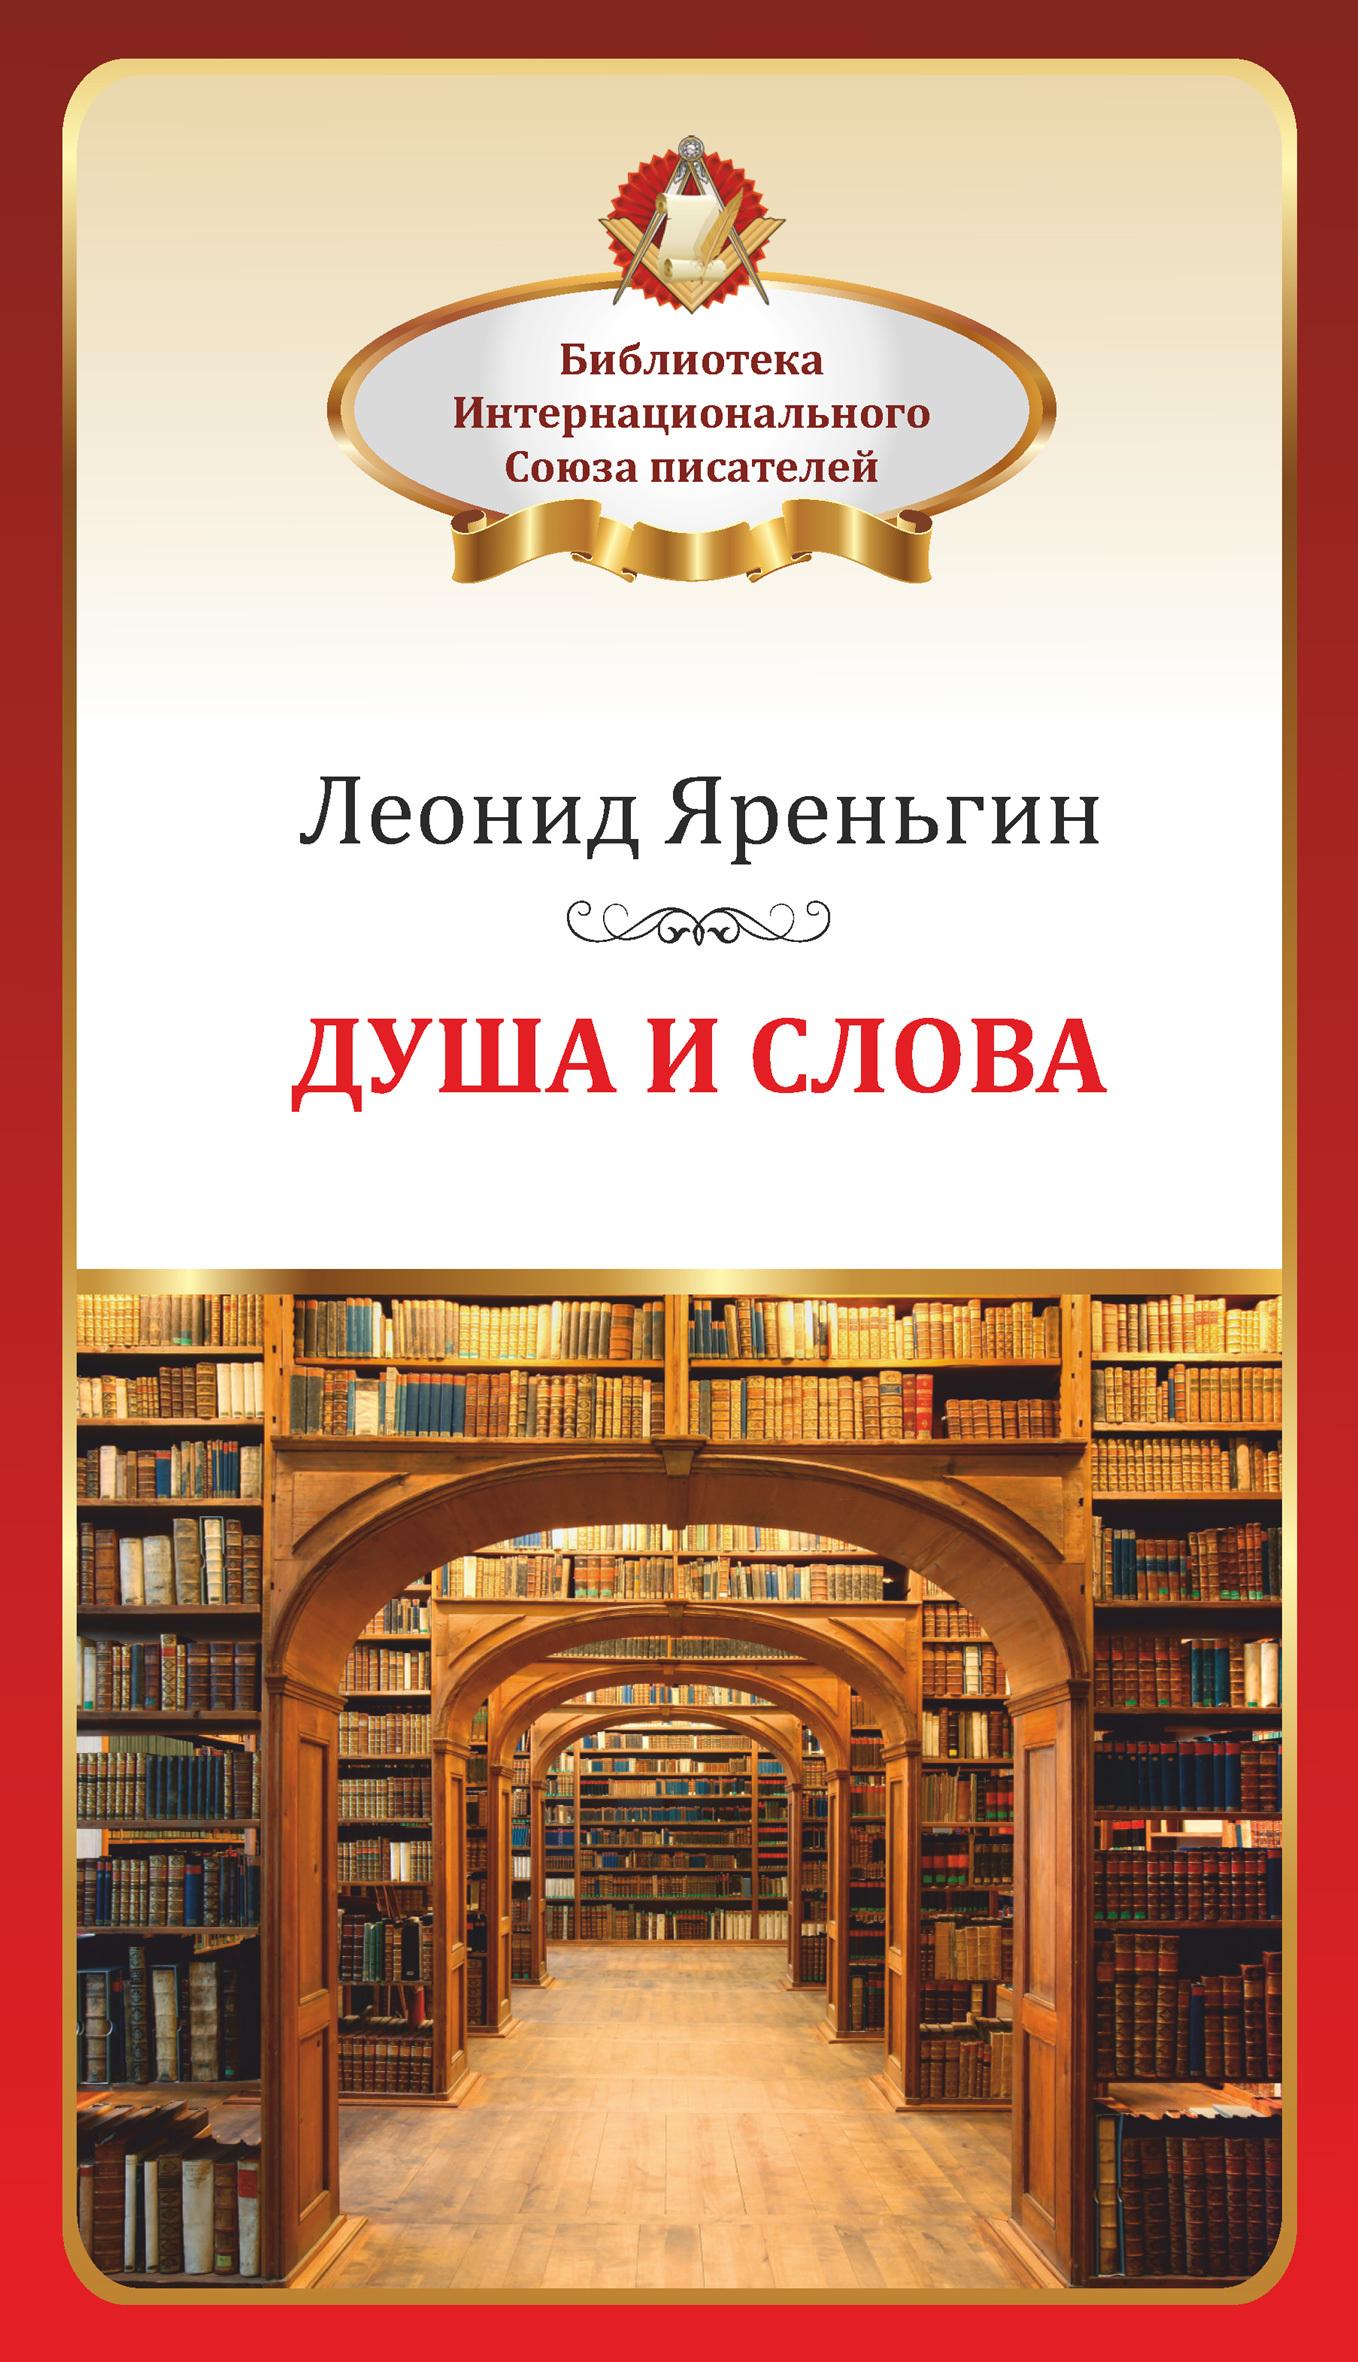 Леонид Яреньгин Душа и слова